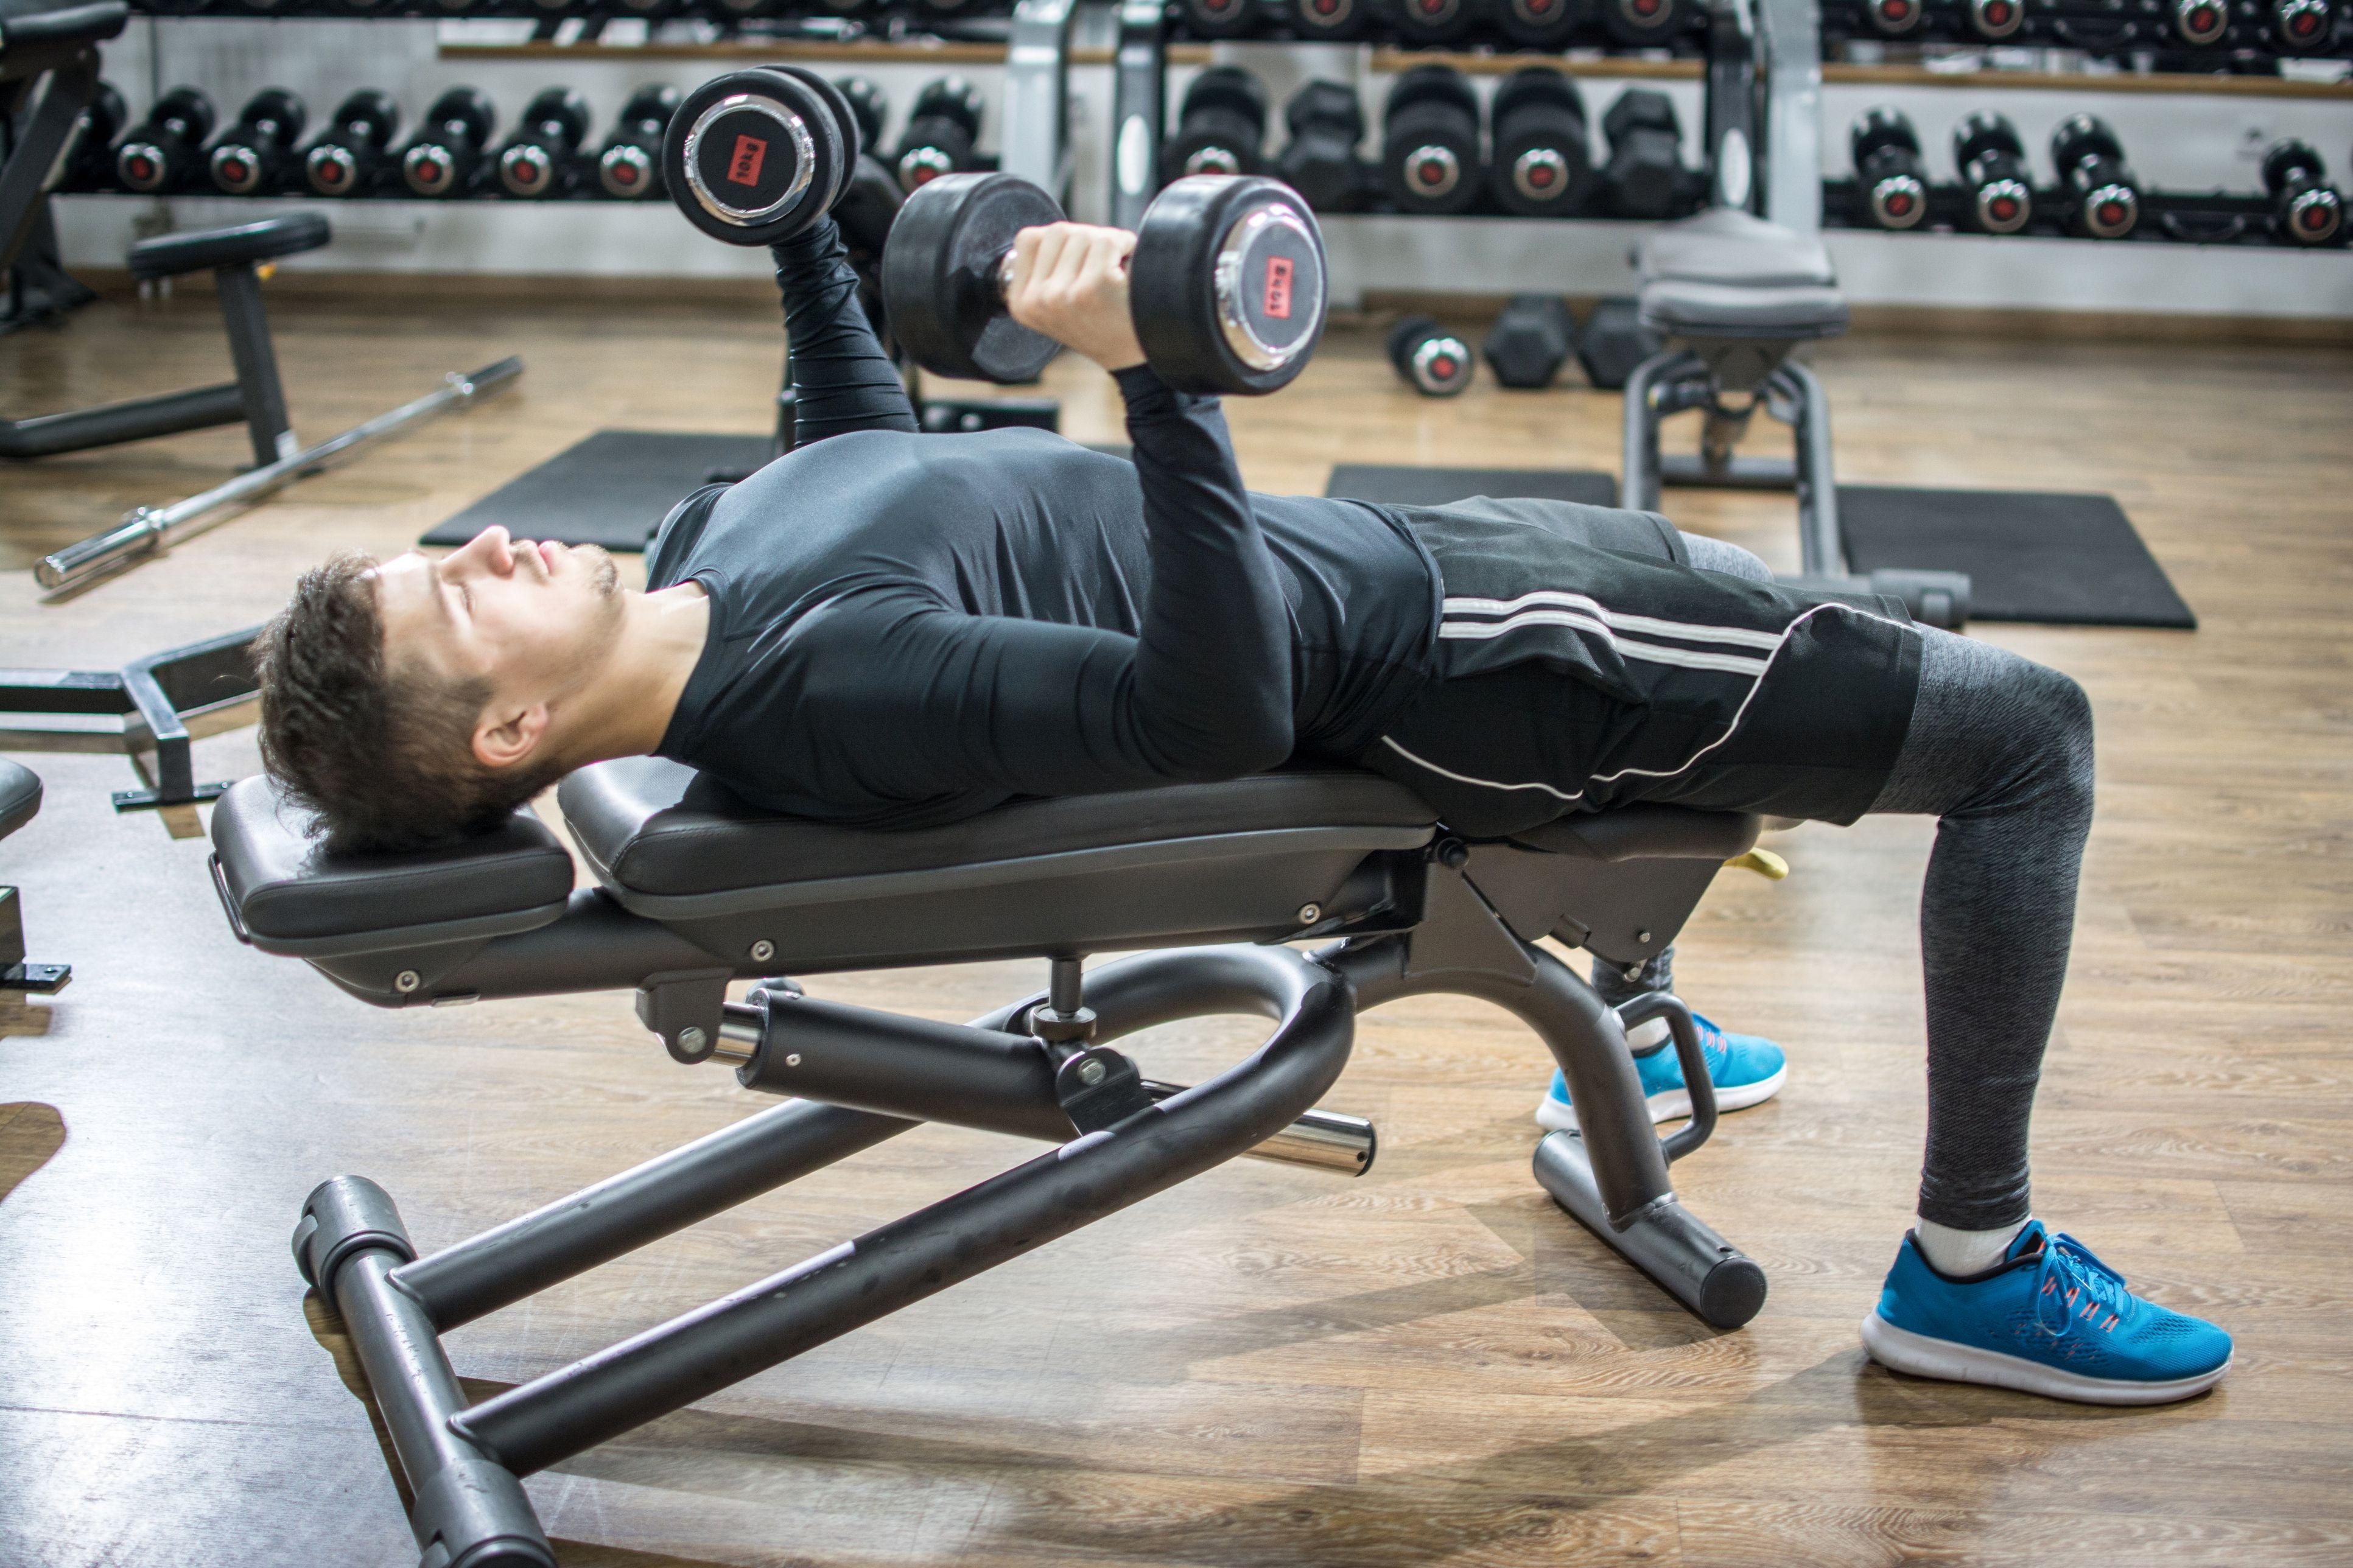 Black men sex on workout bench